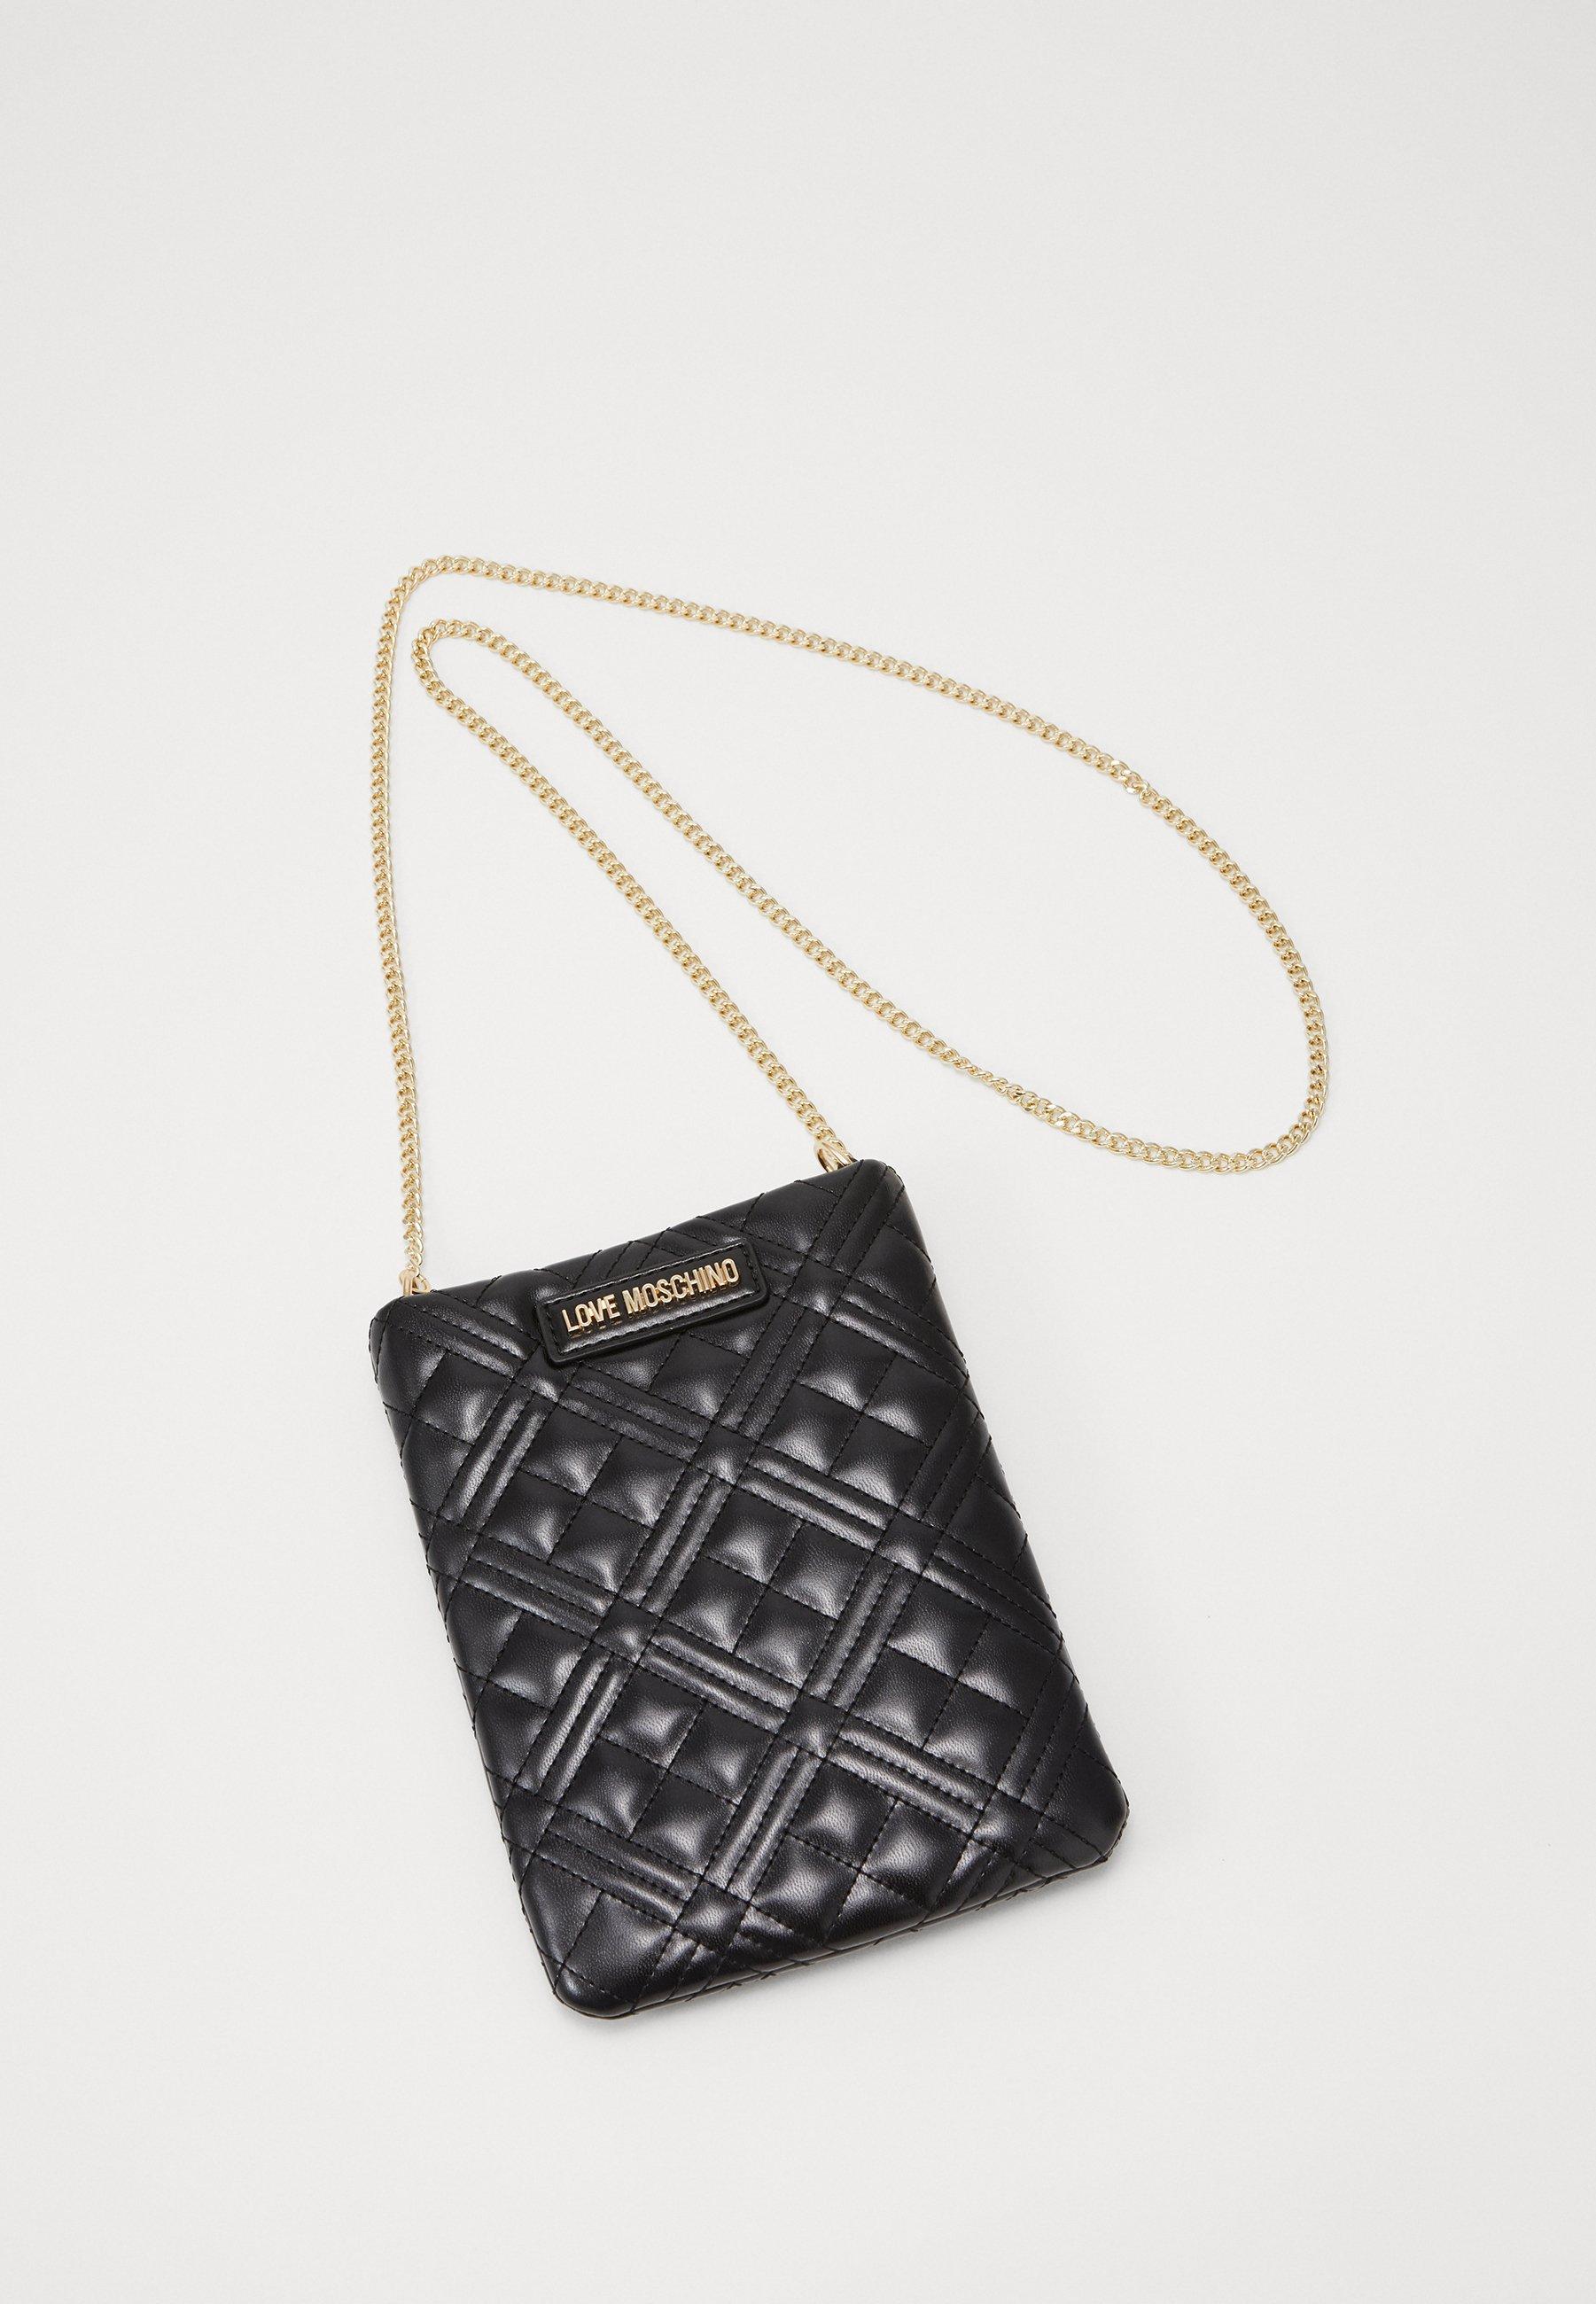 Cheap And Nice New And Fashion Accessories Love Moschino BORSA Across body bag black mR2GQgOjs txQc7N7R0